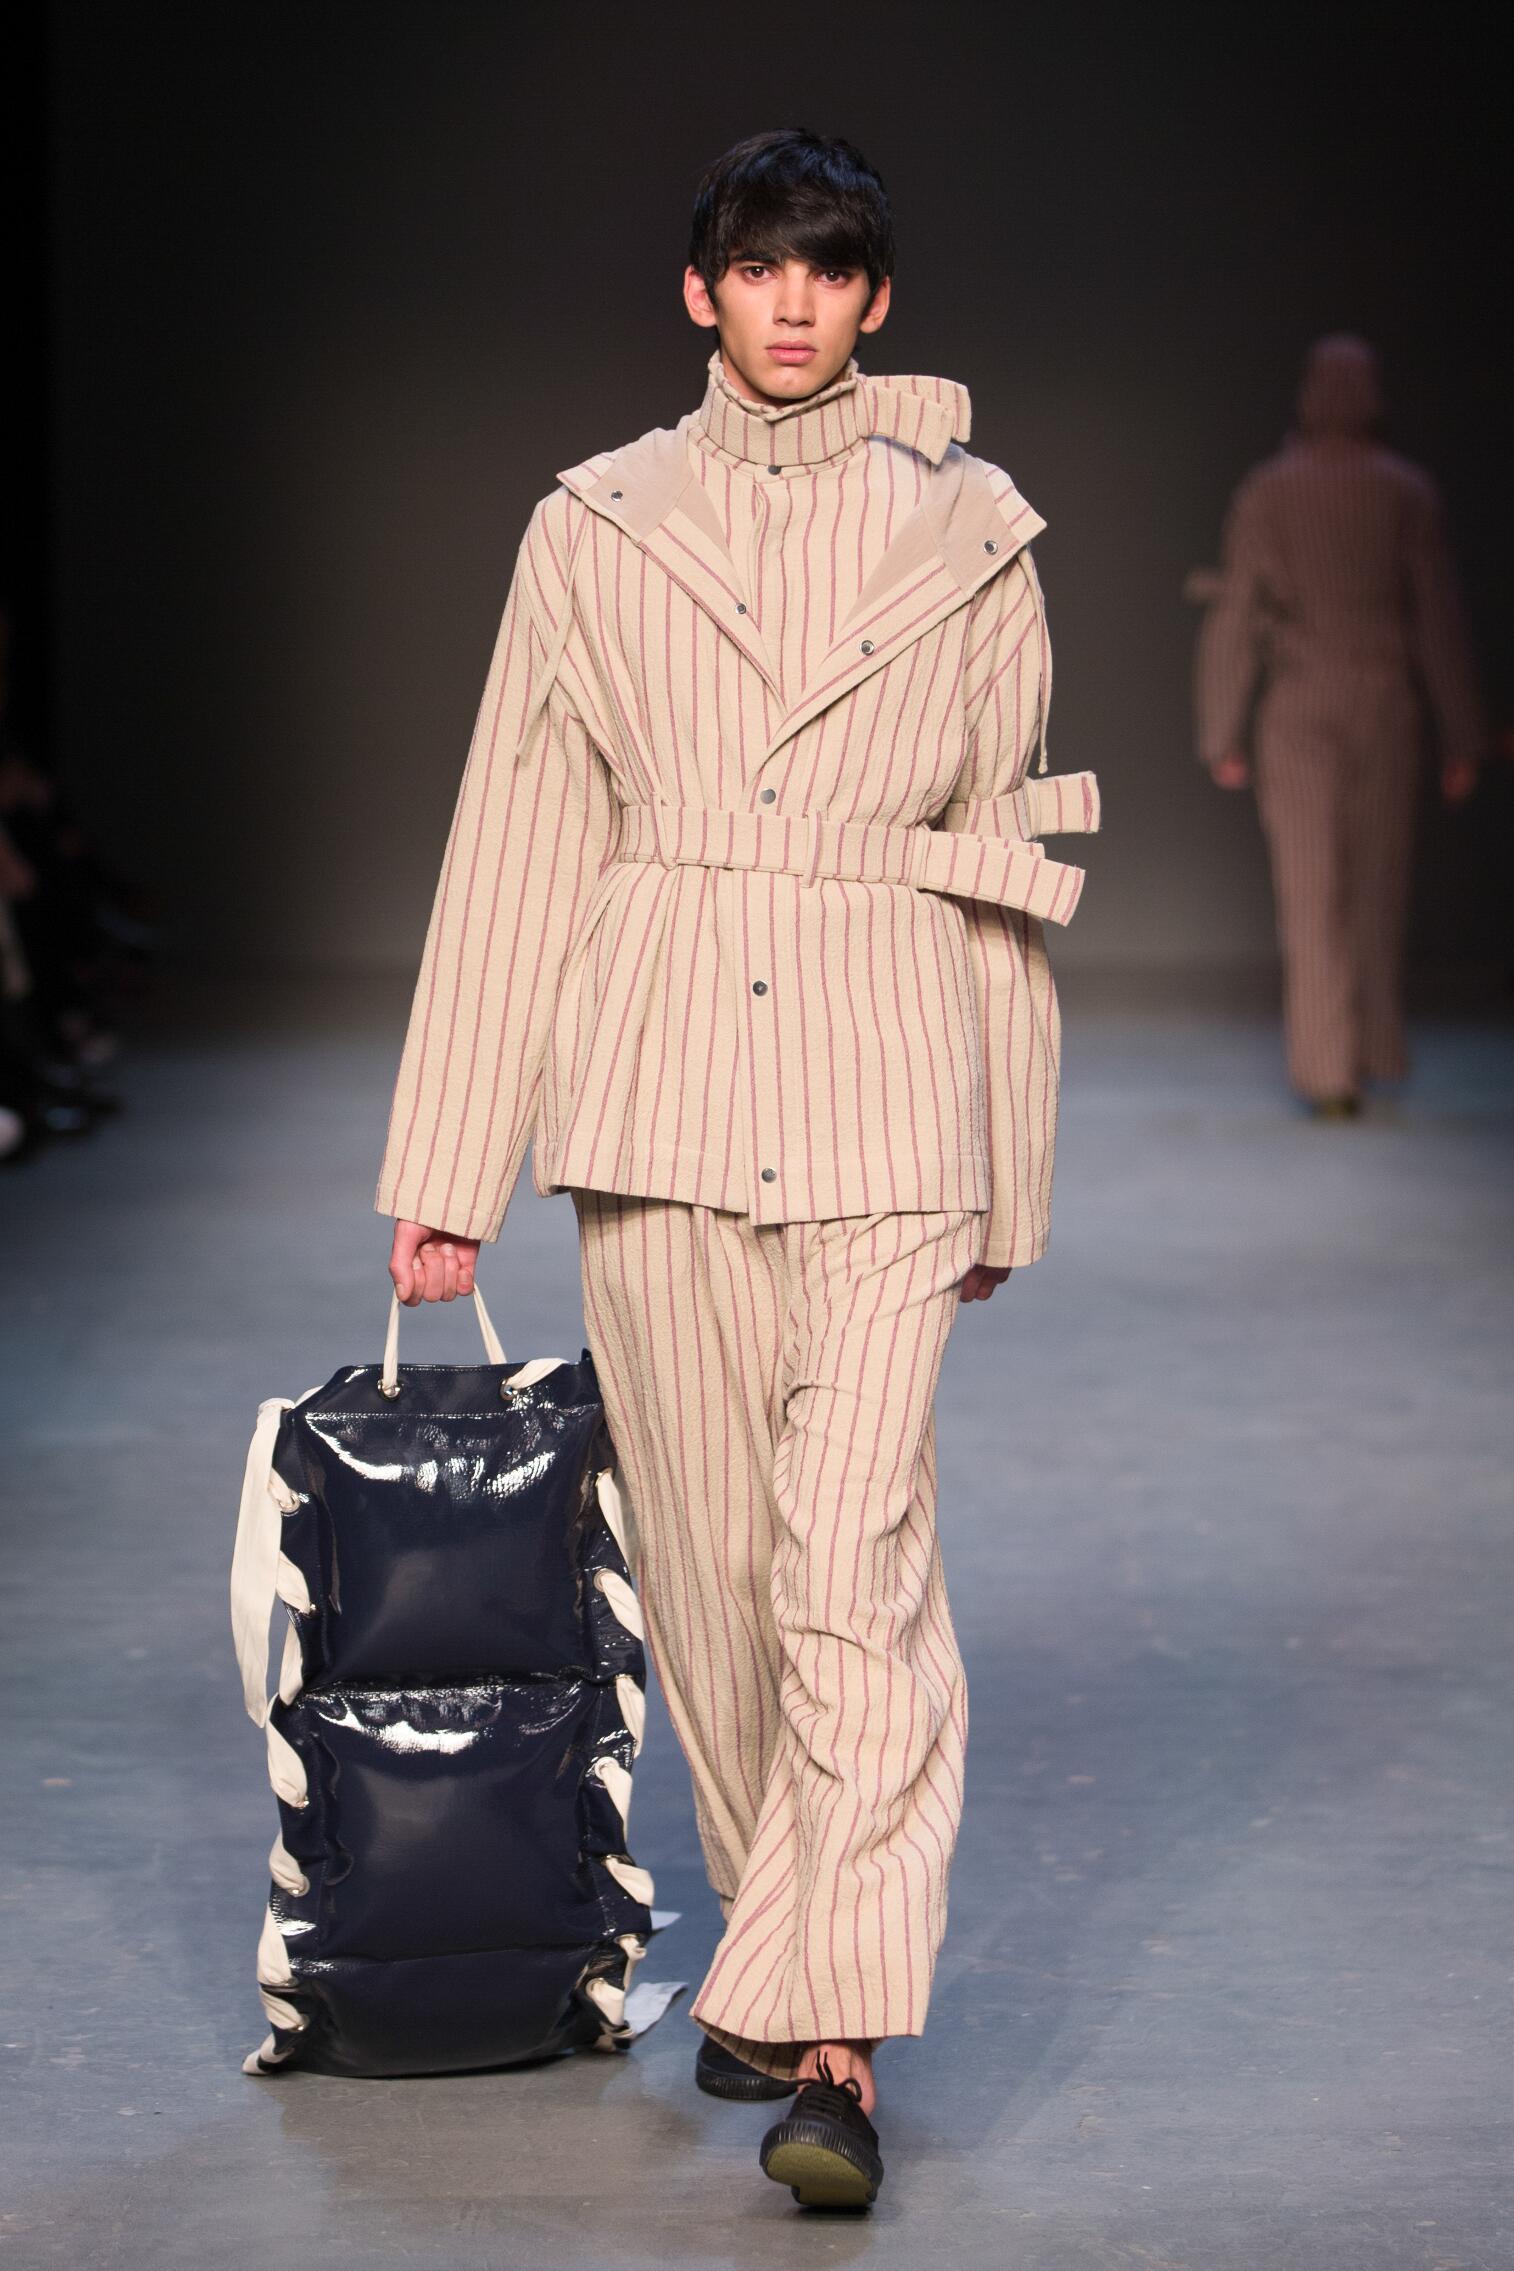 Craig Green Fall Winter 2016 Mens Collection London Fashion Week